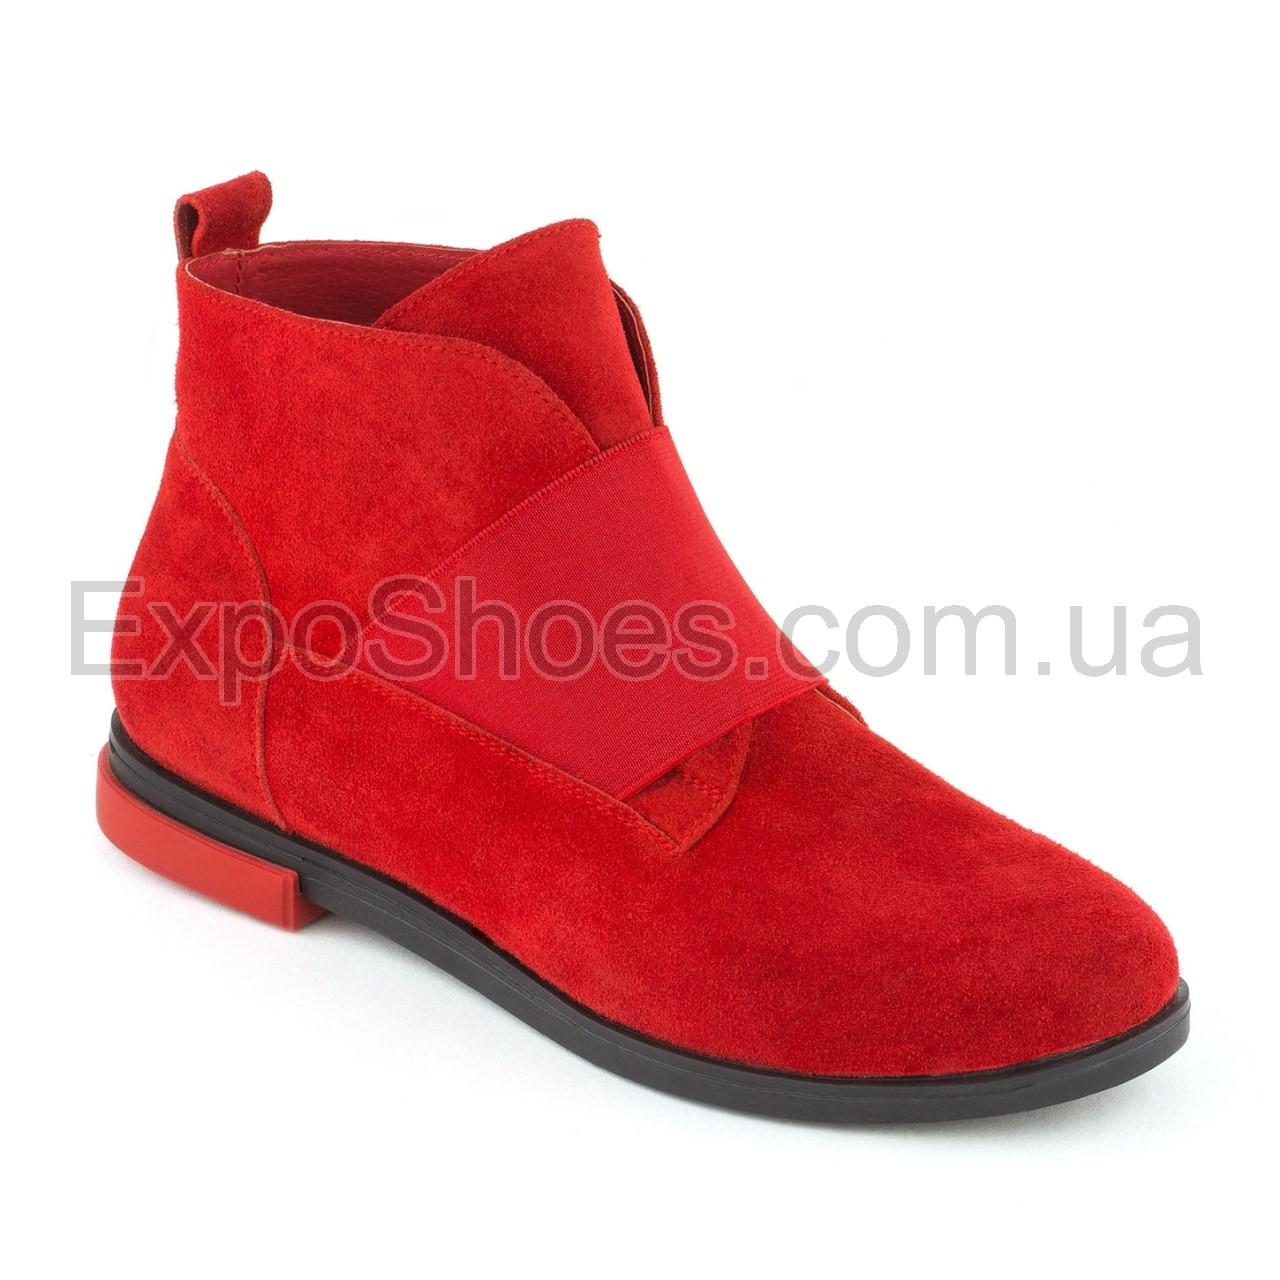 Женский ботинок Meri